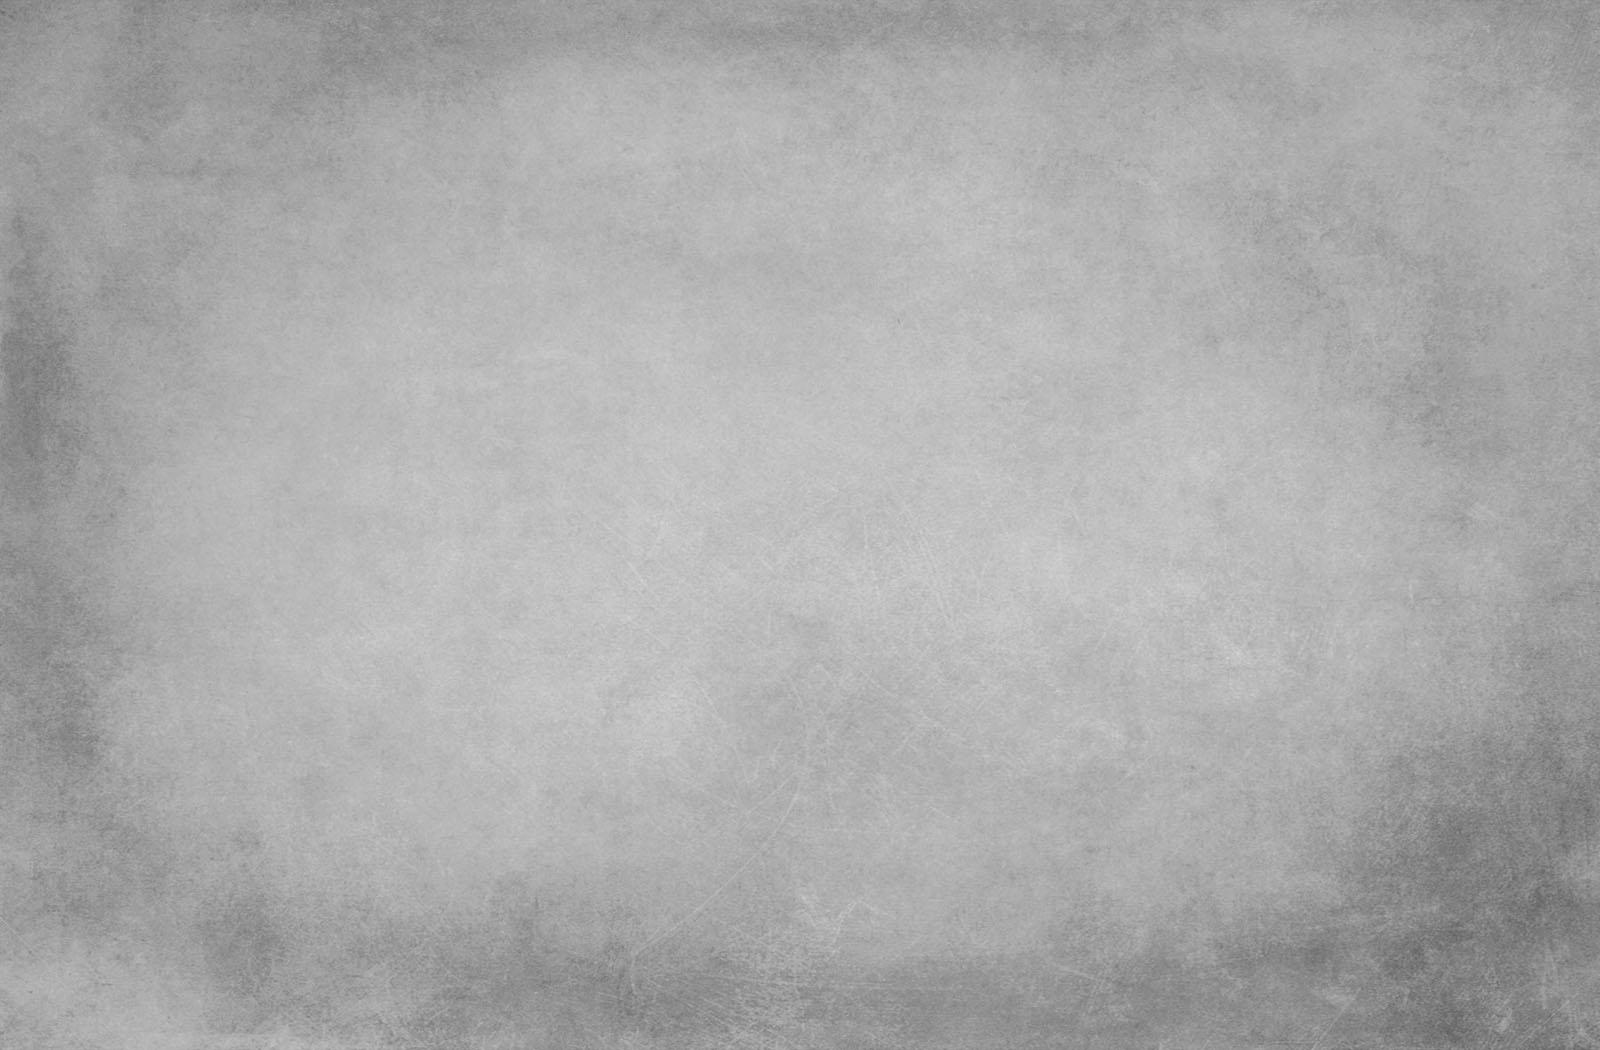 Grey Stripes Light Color Wallpaper Solid Silk Gray 1600x1050